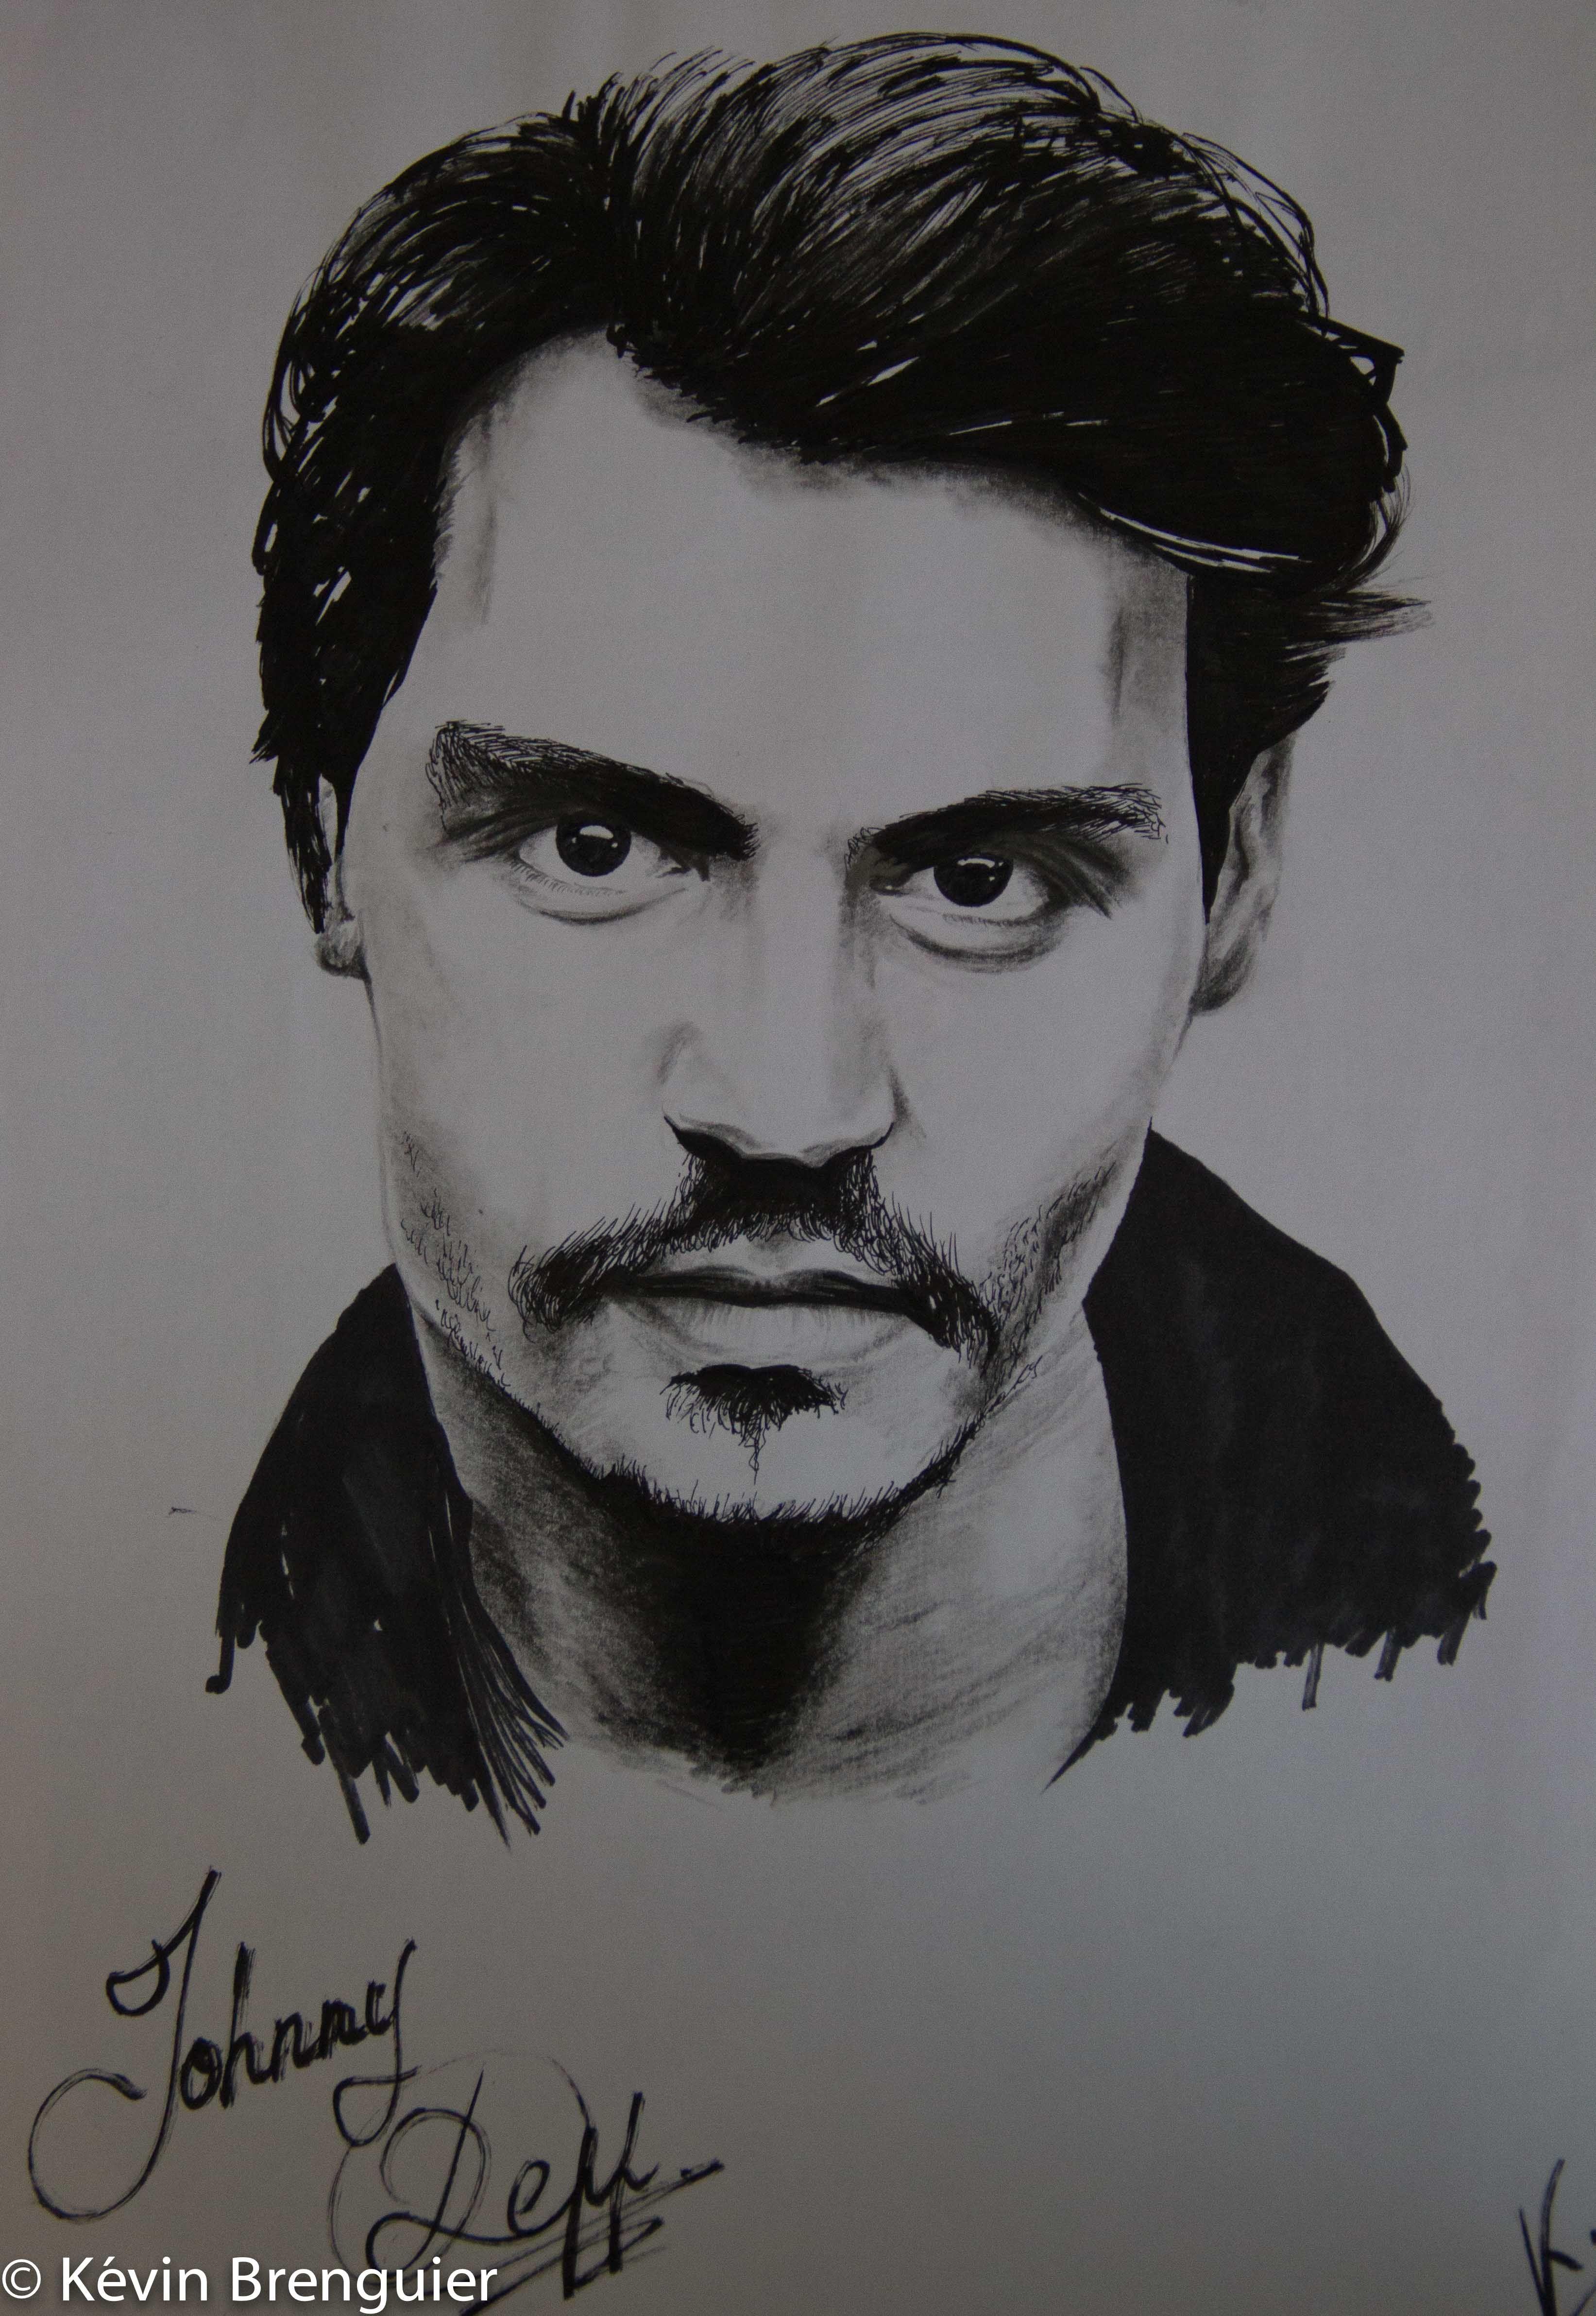 Johnny depp dessin dessin - Dessin johnny depp ...